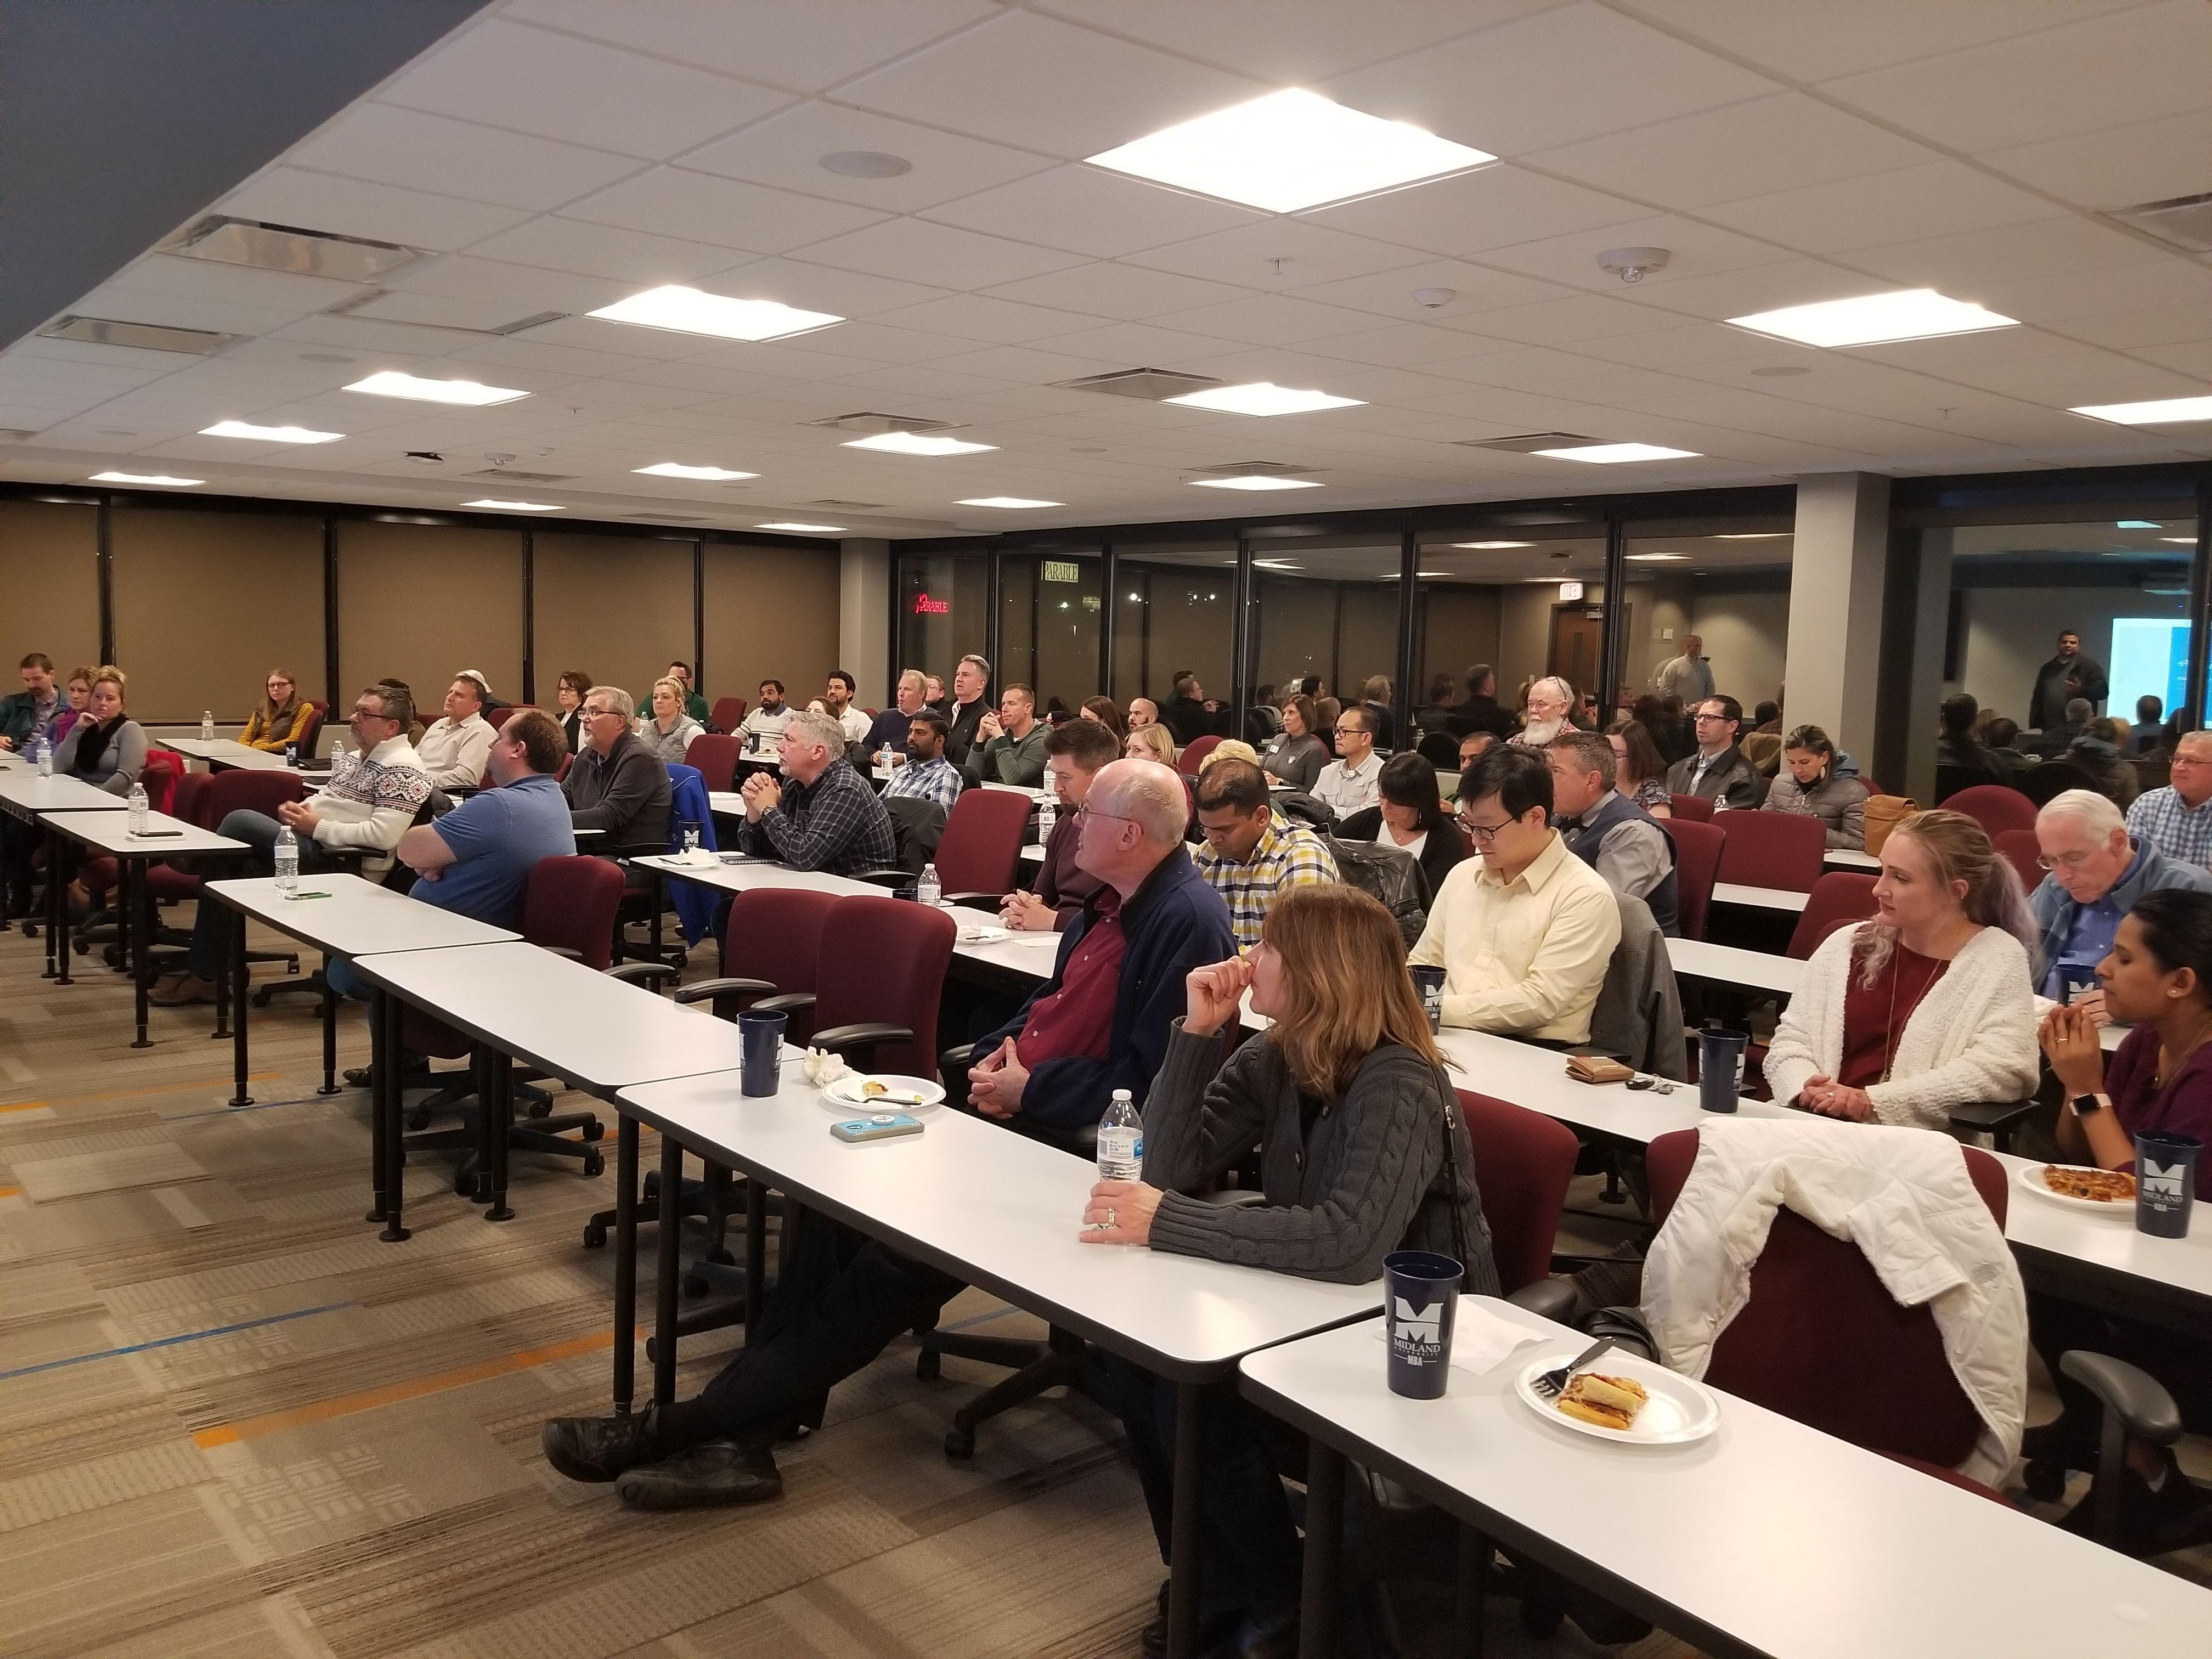 Omaha Agile Development